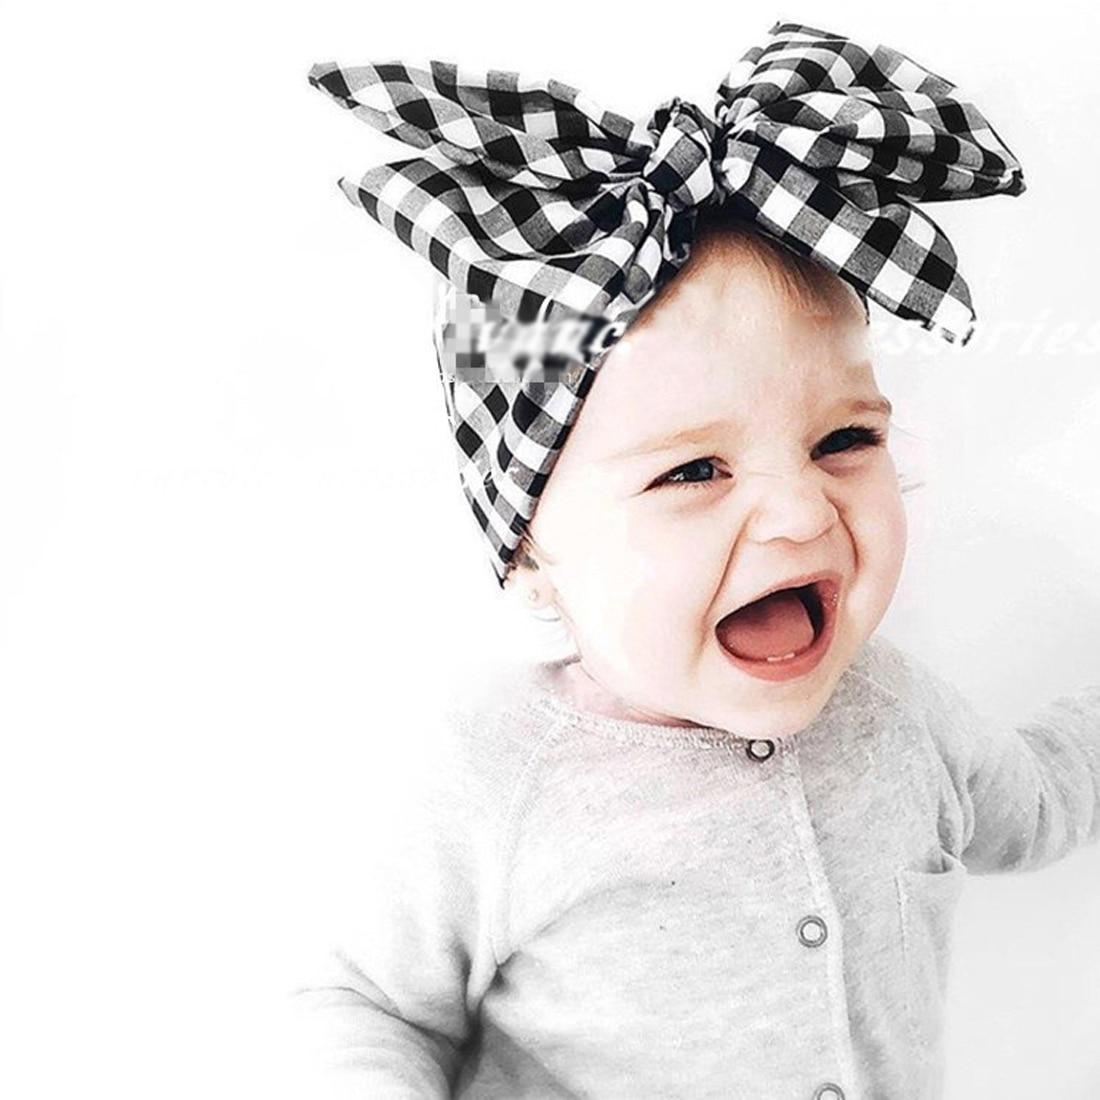 2017 Boys Girls Headbands Newborn Red Black Pink lattice Butterfly Bowknot Hairband Turban Headwear Cute Plaid Headdress 1PC